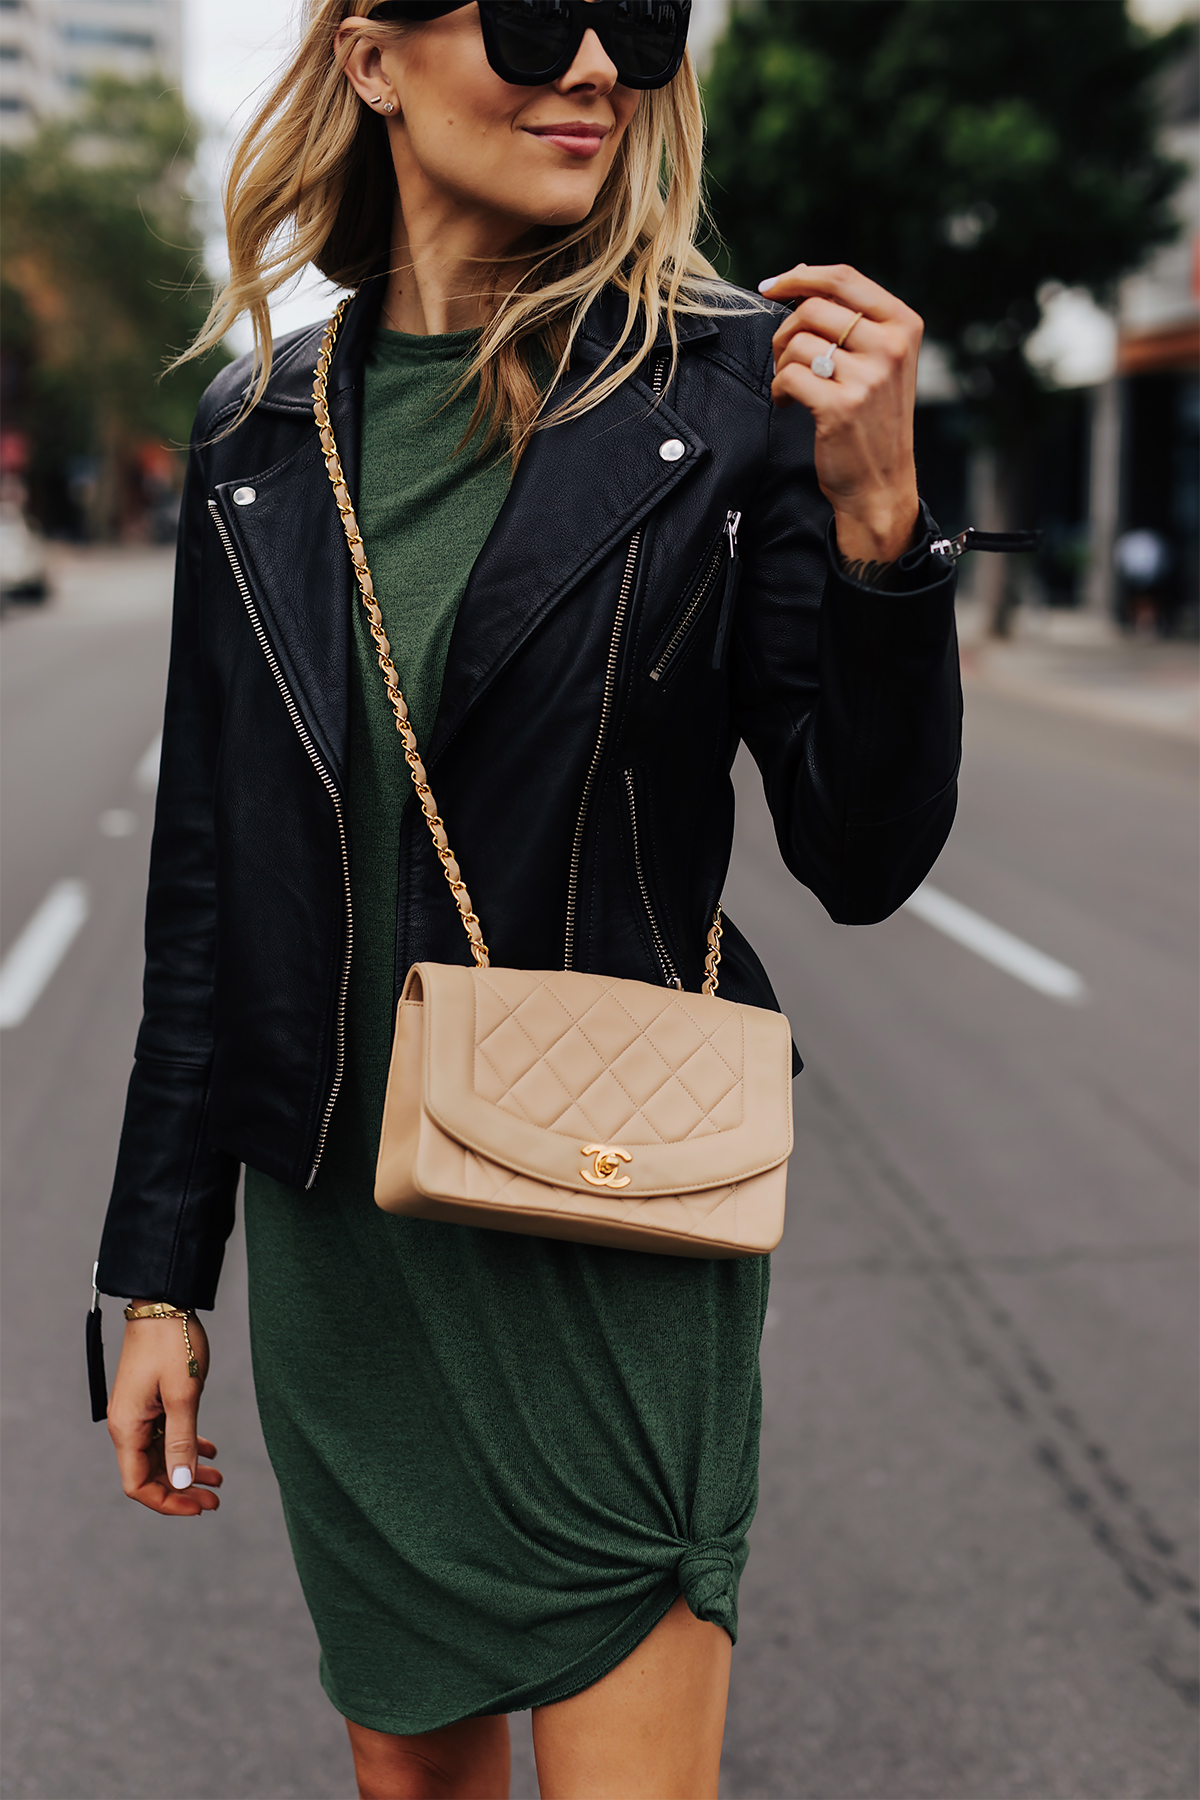 Blonde Woman Wearing Green Tshirt Dress Black Leather Jacket Chanel Beige Crossbody Fashion Jackson San Diego Fashion Blogger Street Style